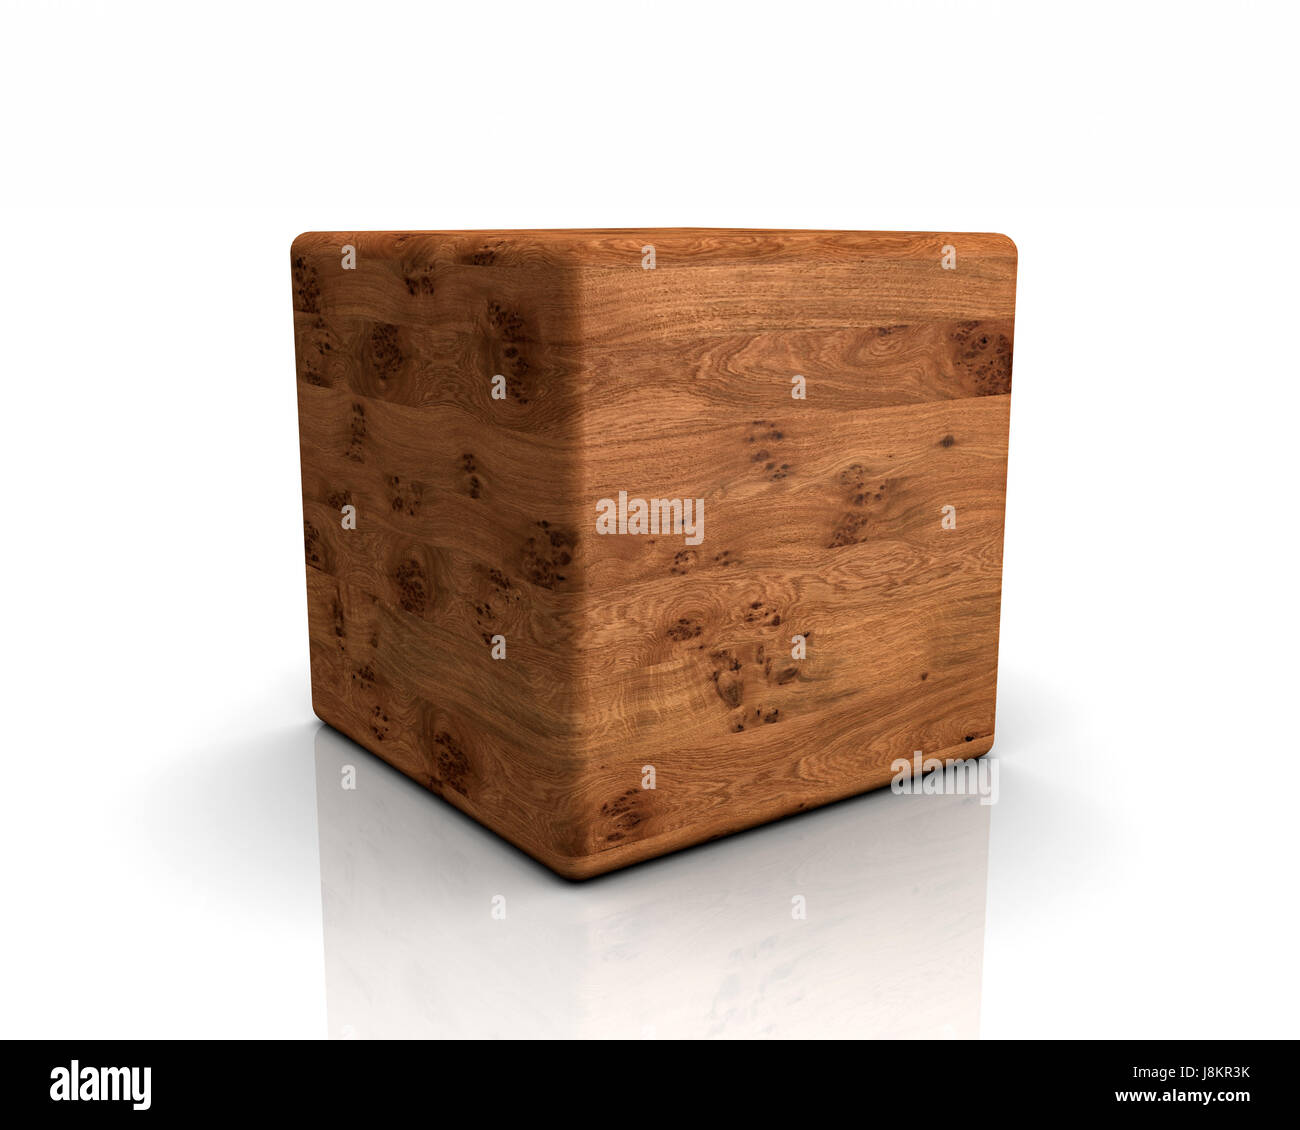 wood cubes furniture. Wood, Shelf, Wooden Board, Veneer, Cubes, Optional, Furniture, Brown Wood Cubes Furniture I